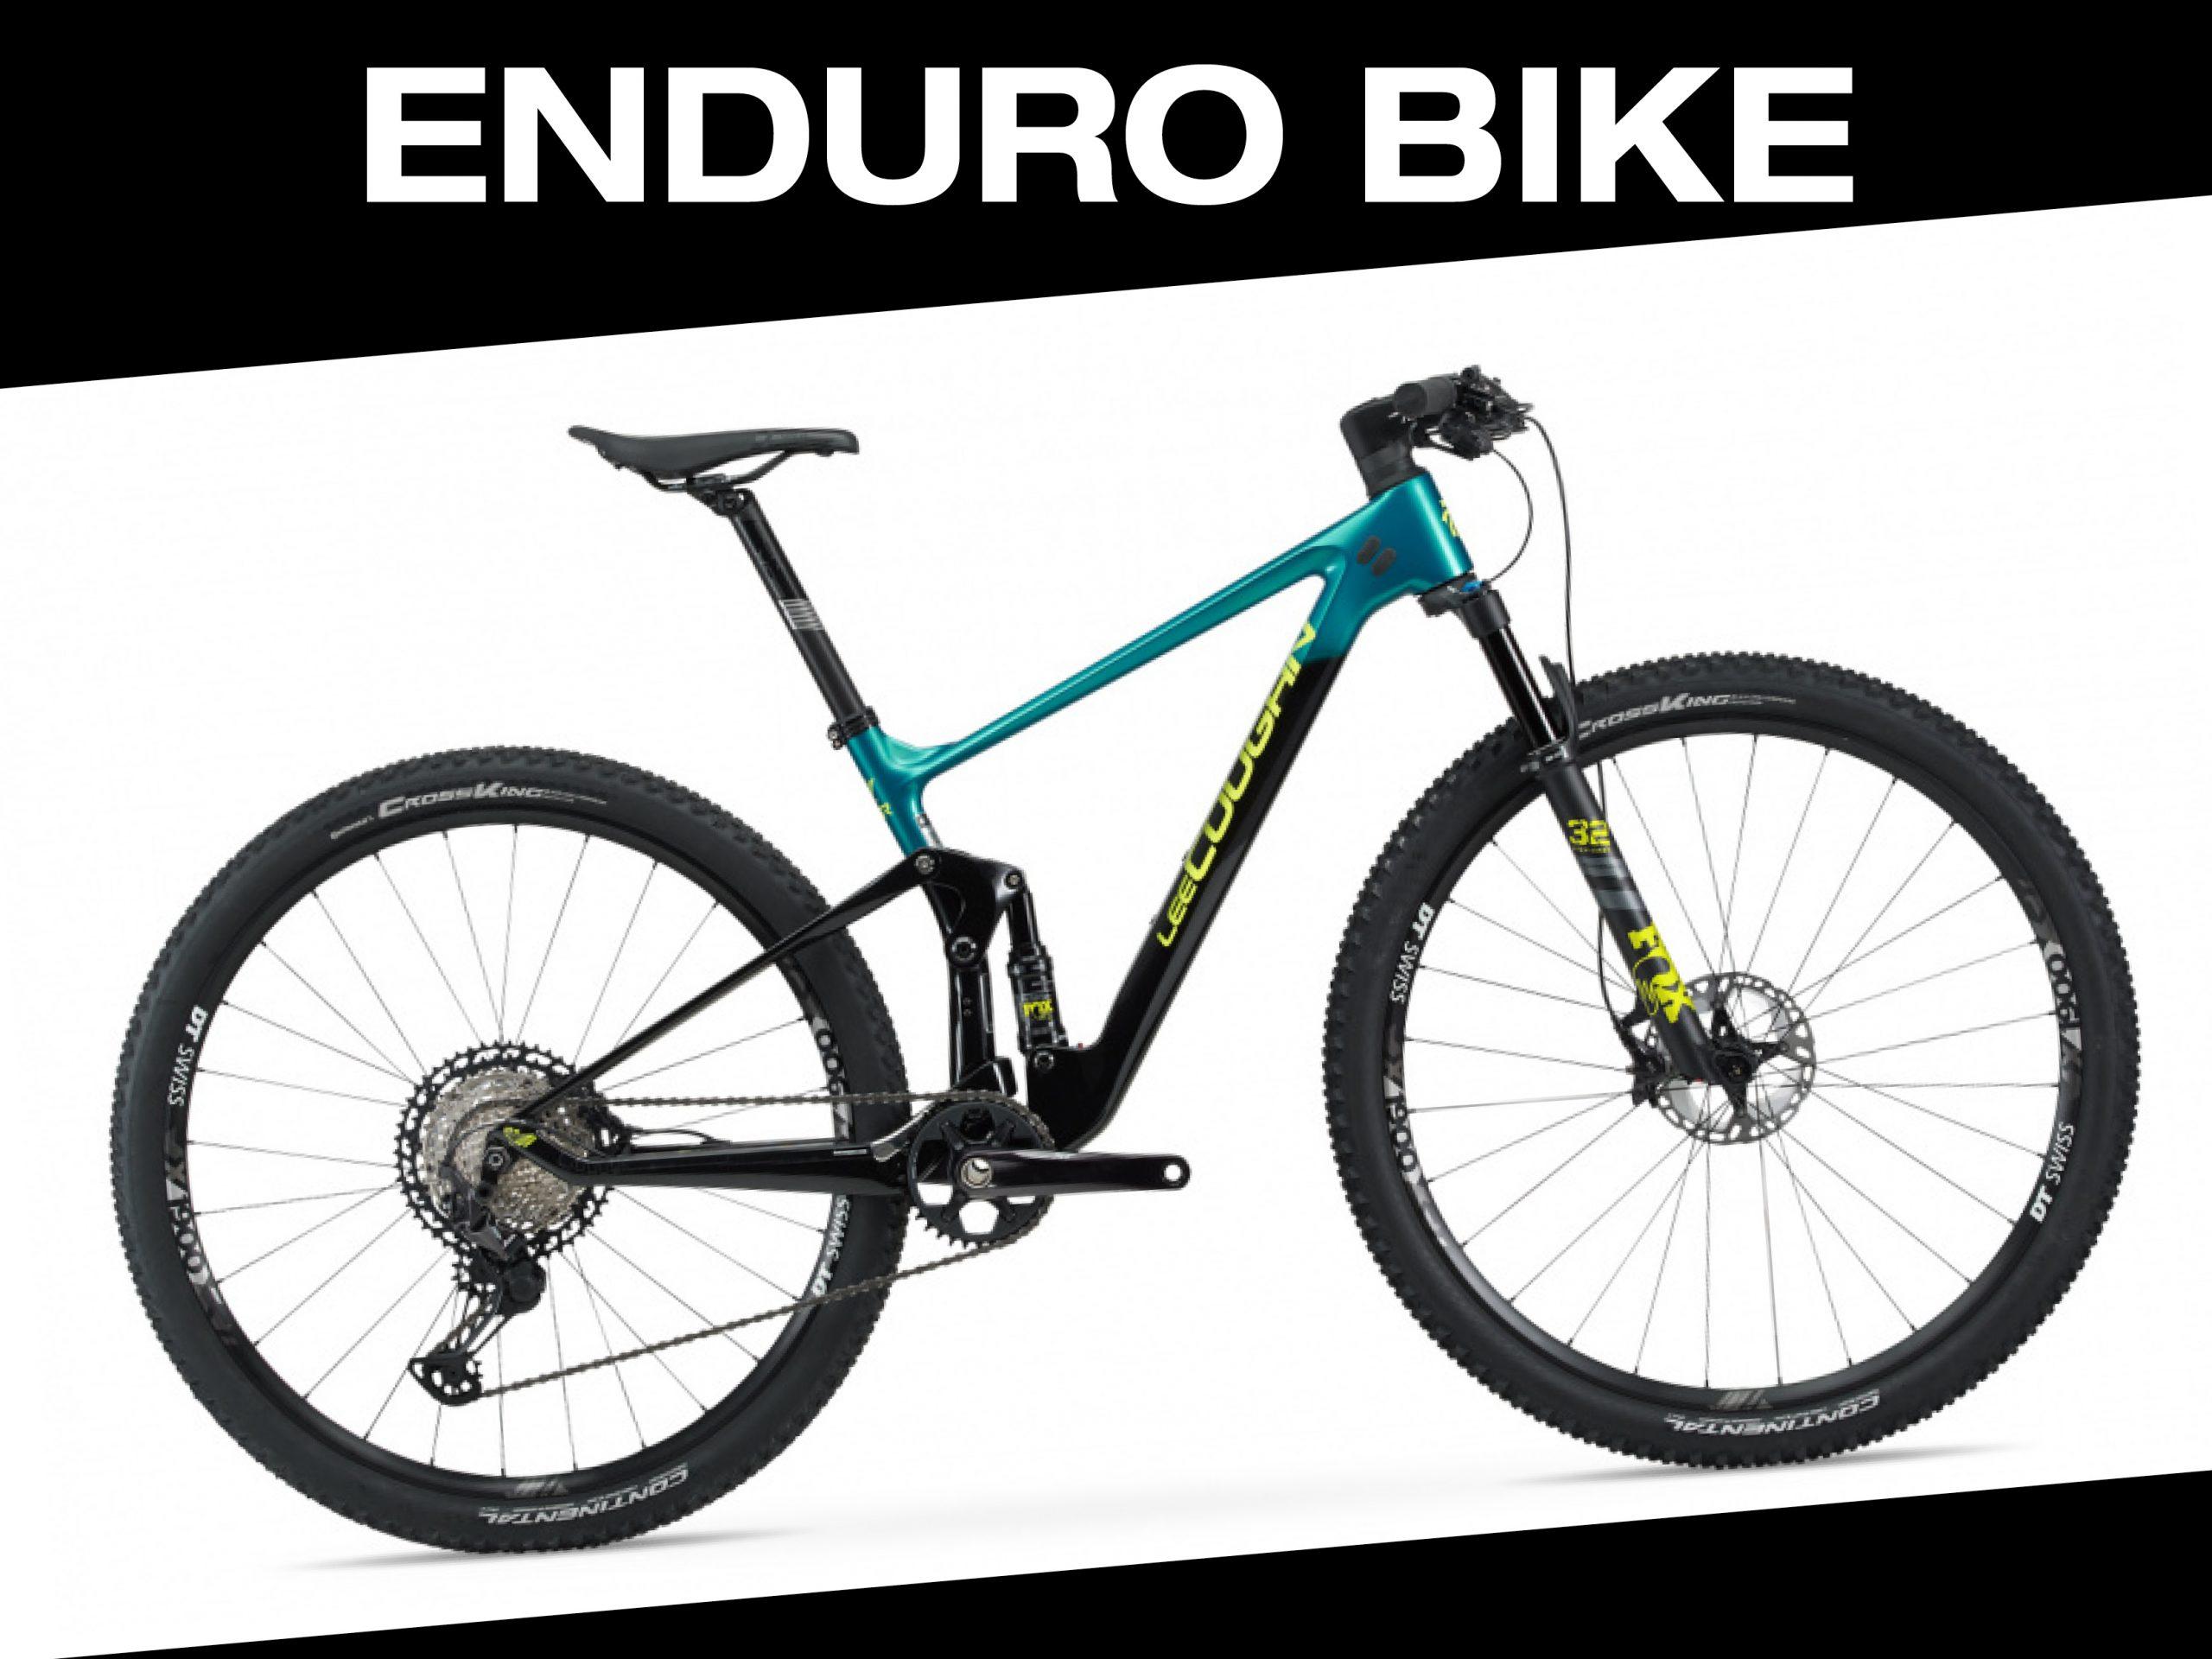 Enduro Bike SAV Bike